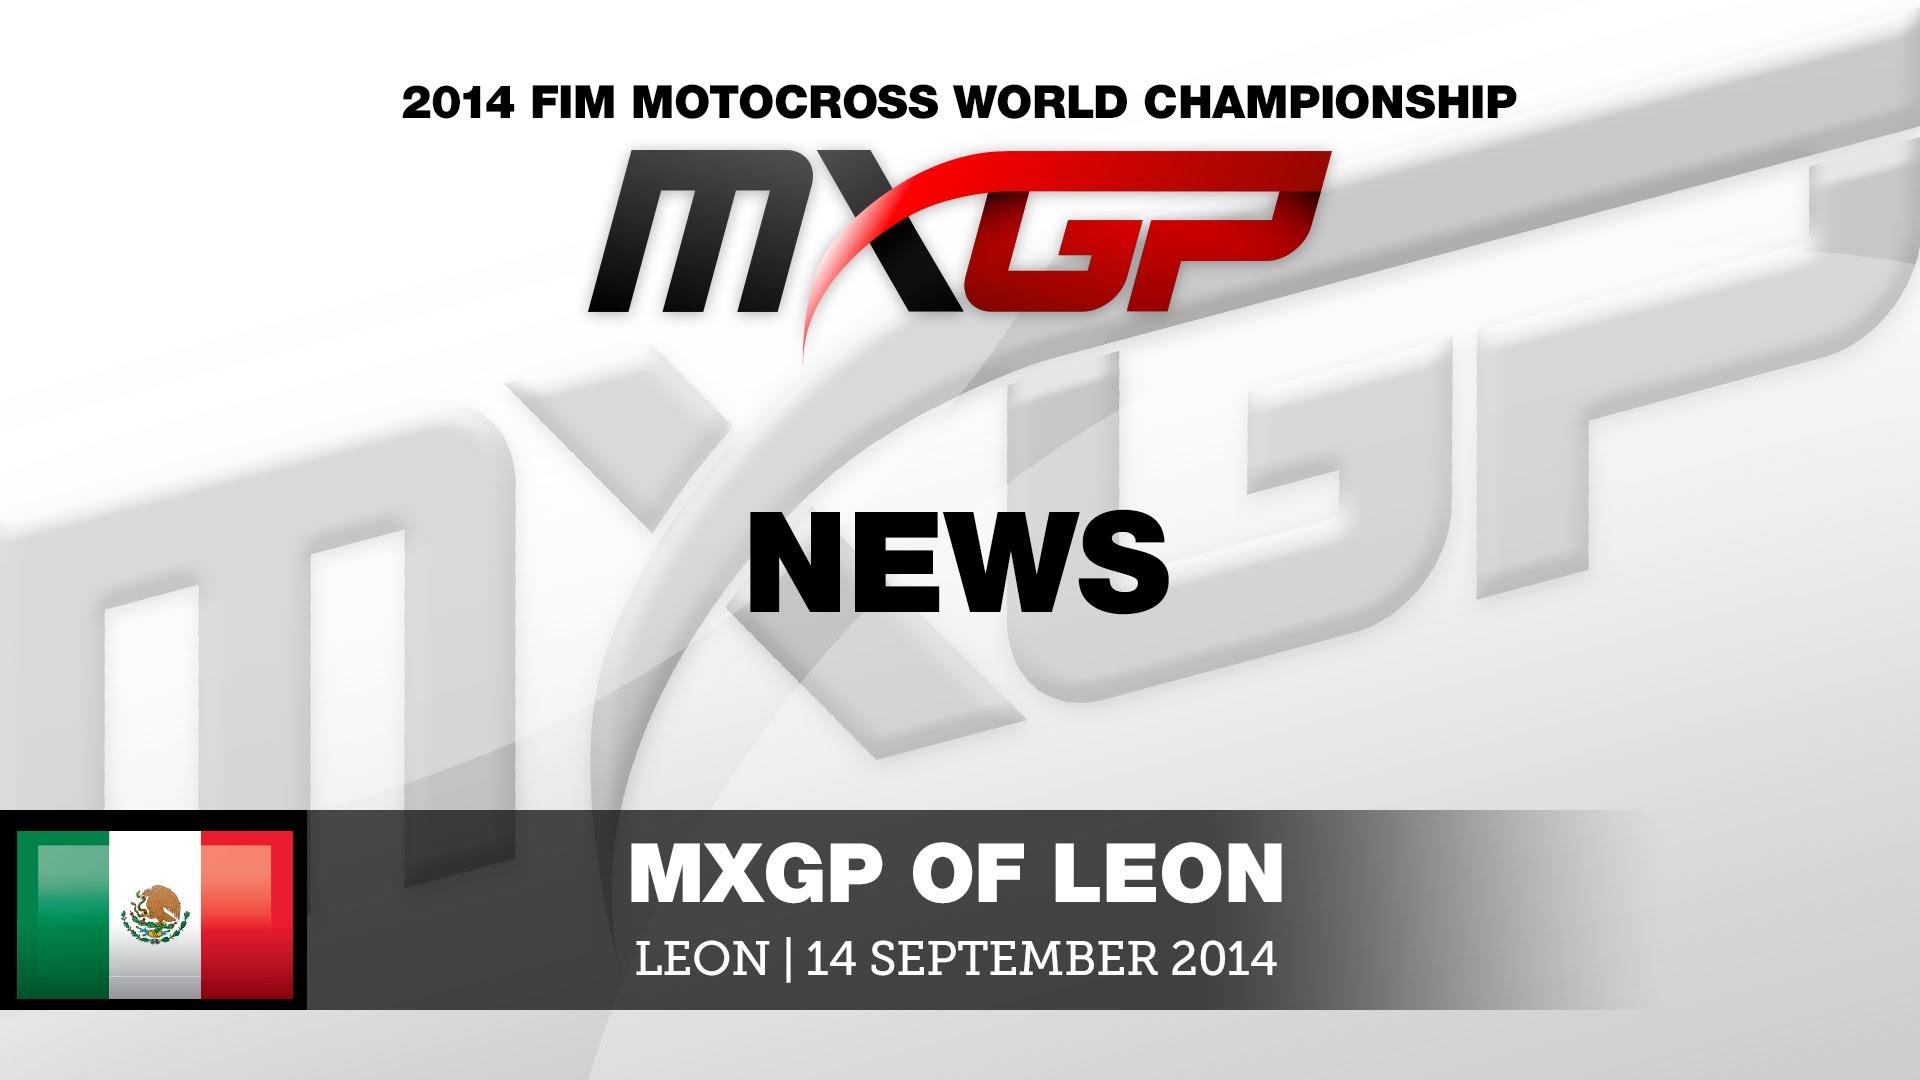 MXGP of Leon 2014 Highlights - Motocross